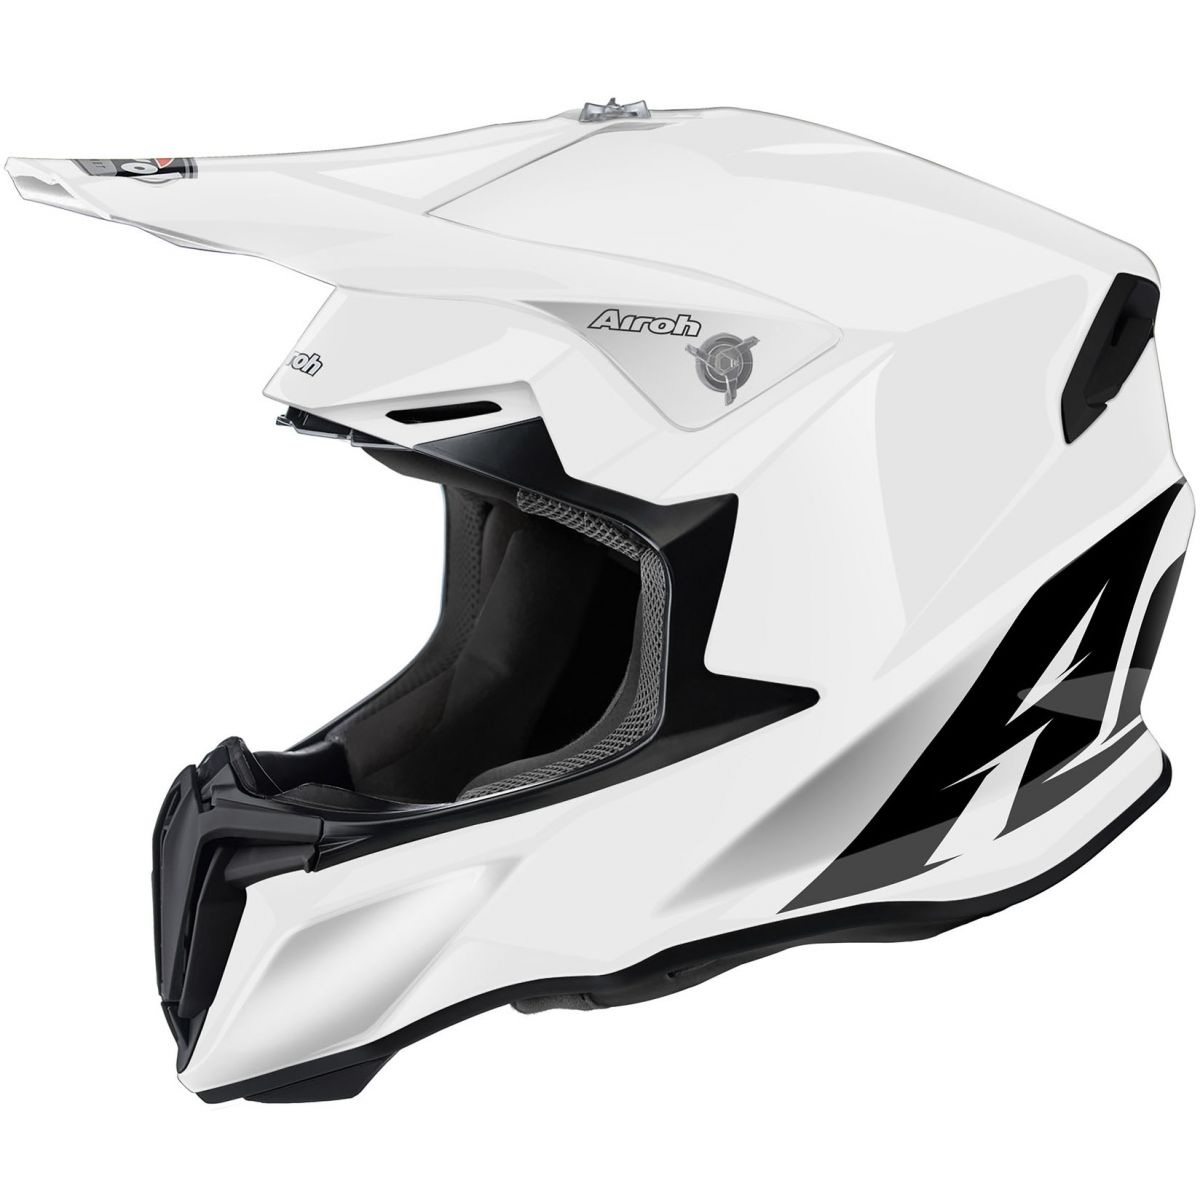 Airoh - Twist White шлем, белый